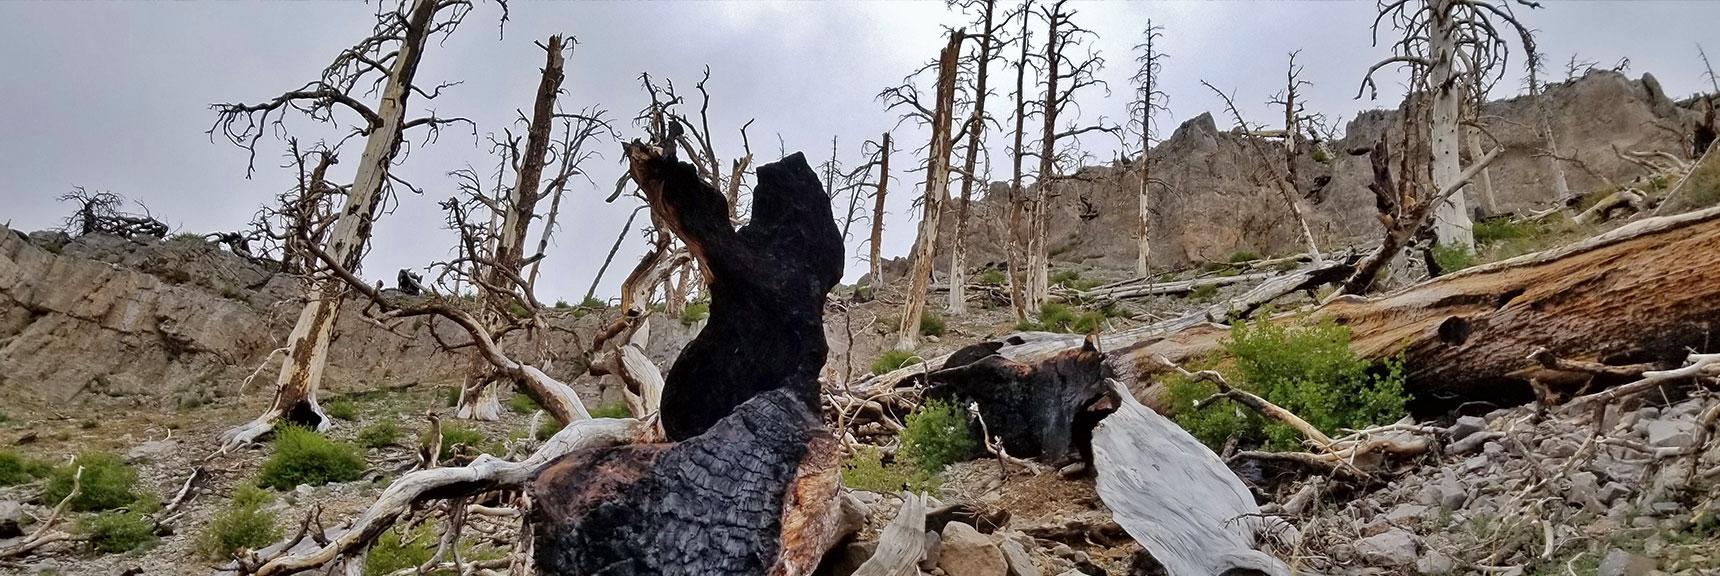 Skirting Below Cliffs on Upper Griffith North Ridge | Harris Mountain Griffith Peak Circuit in Mt. Charleston Wilderness, Nevada